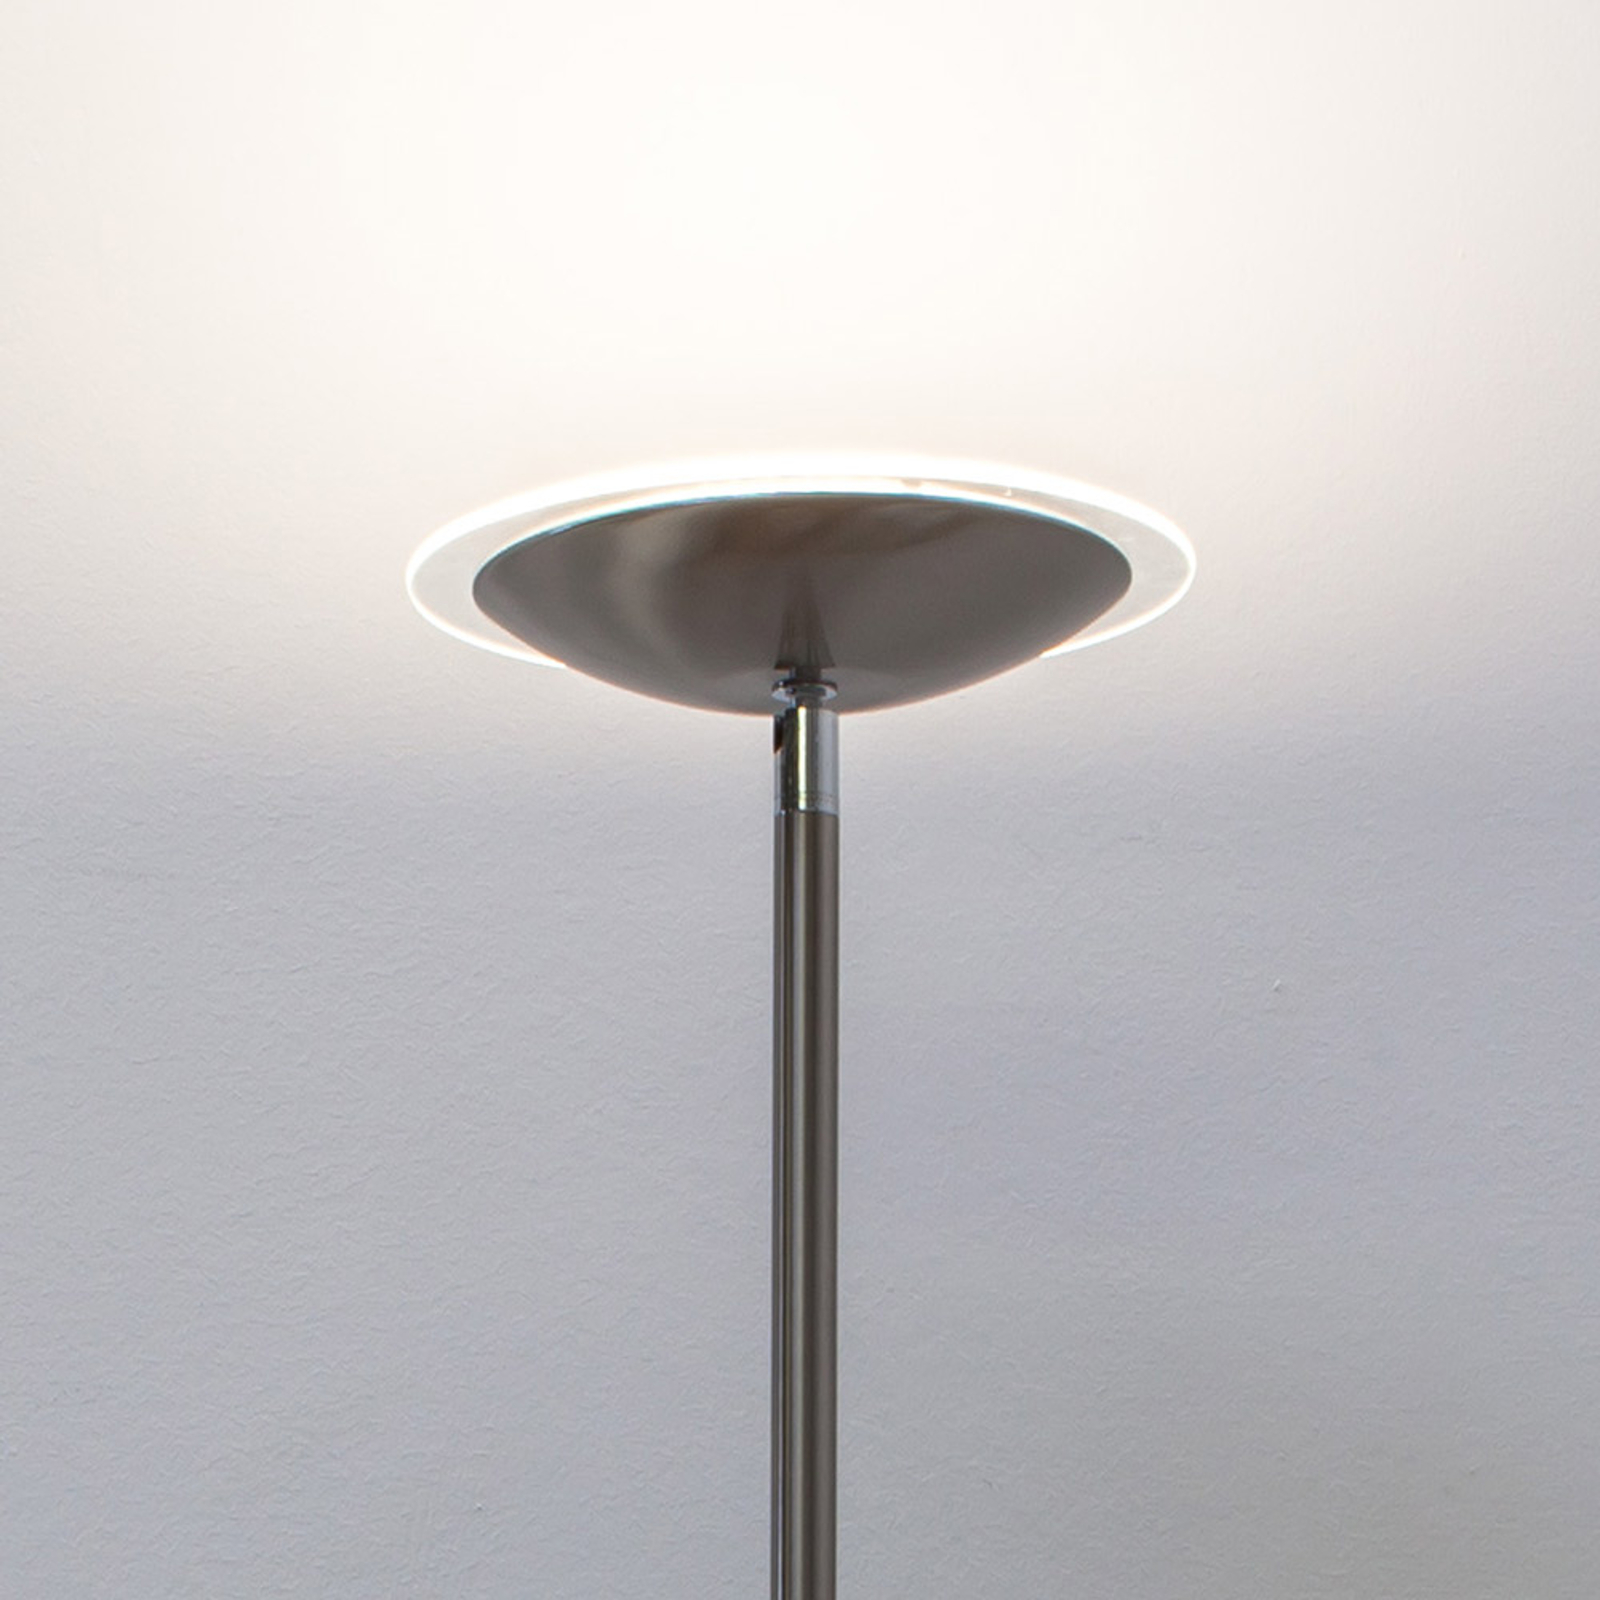 Lampada da terra LED Malea nichel satinato